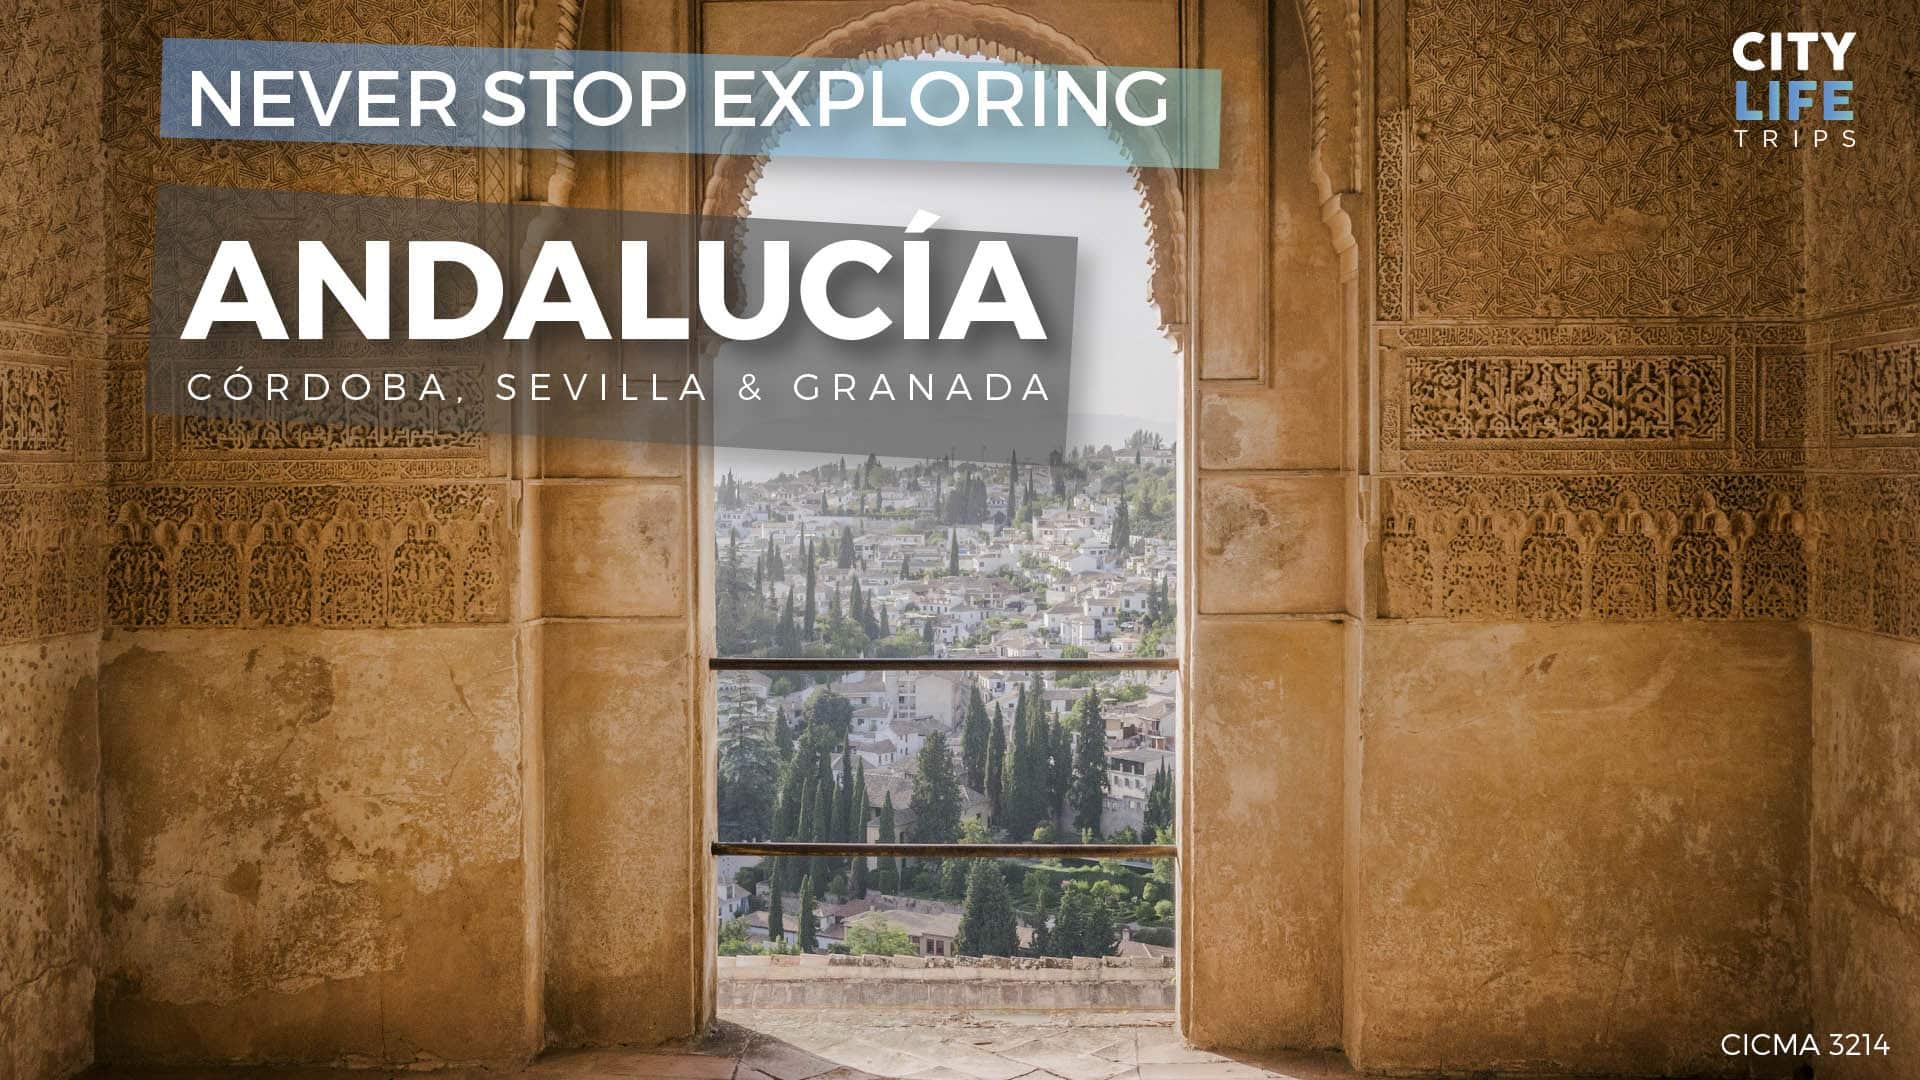 Andalucía #1 – Córdoba, Sevilla & Granada